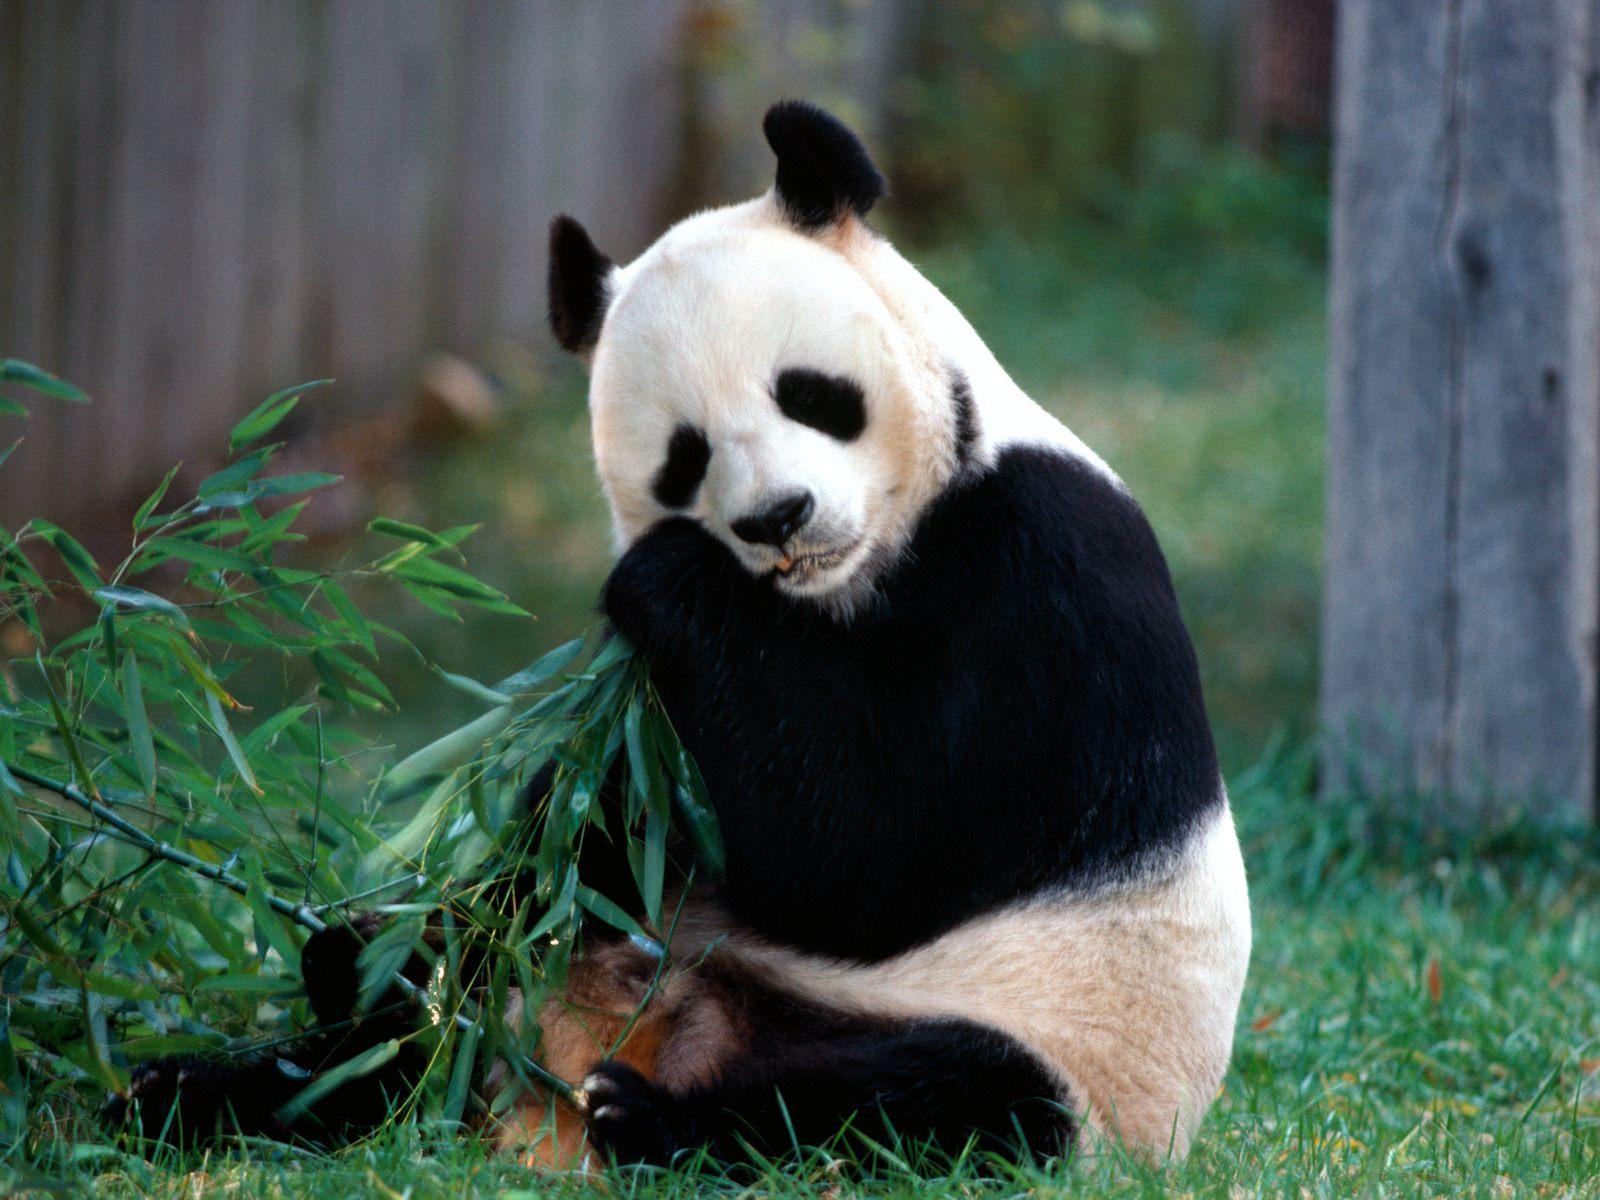 Sfondi animali hd per desktop panda sfondi hd gratis for Sfondi animali hd